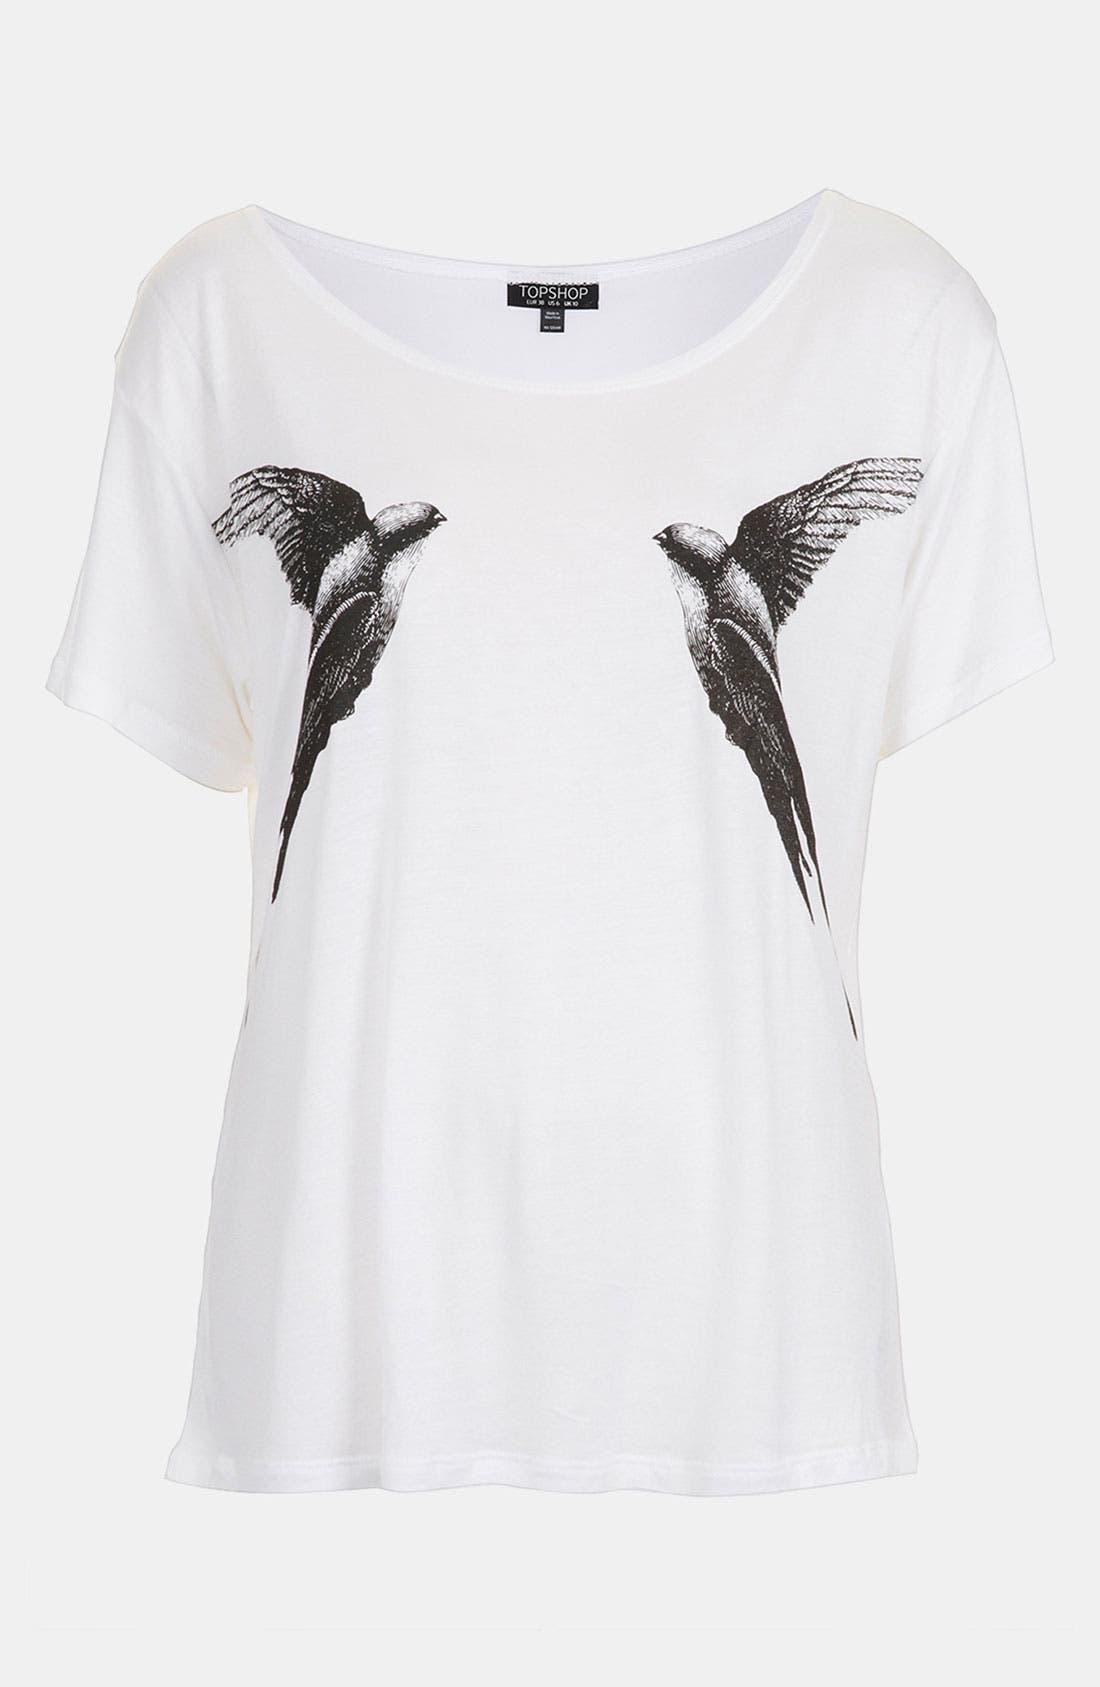 Alternate Image 1 Selected - Topshop 'Mirror Bird' Graphic Tee